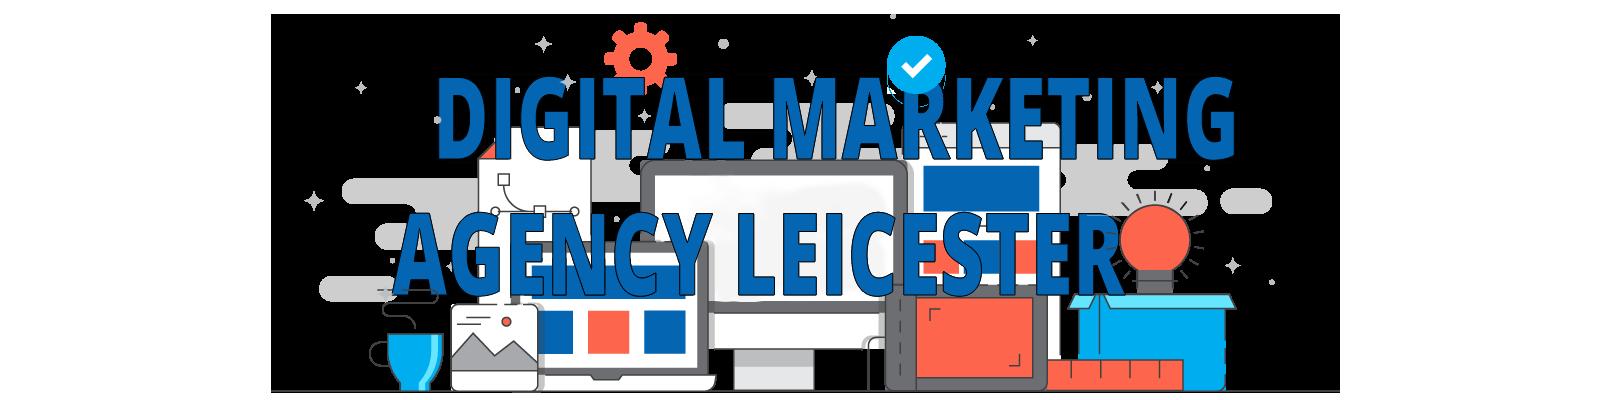 seek social digital marketing agency leicester header with transparent background